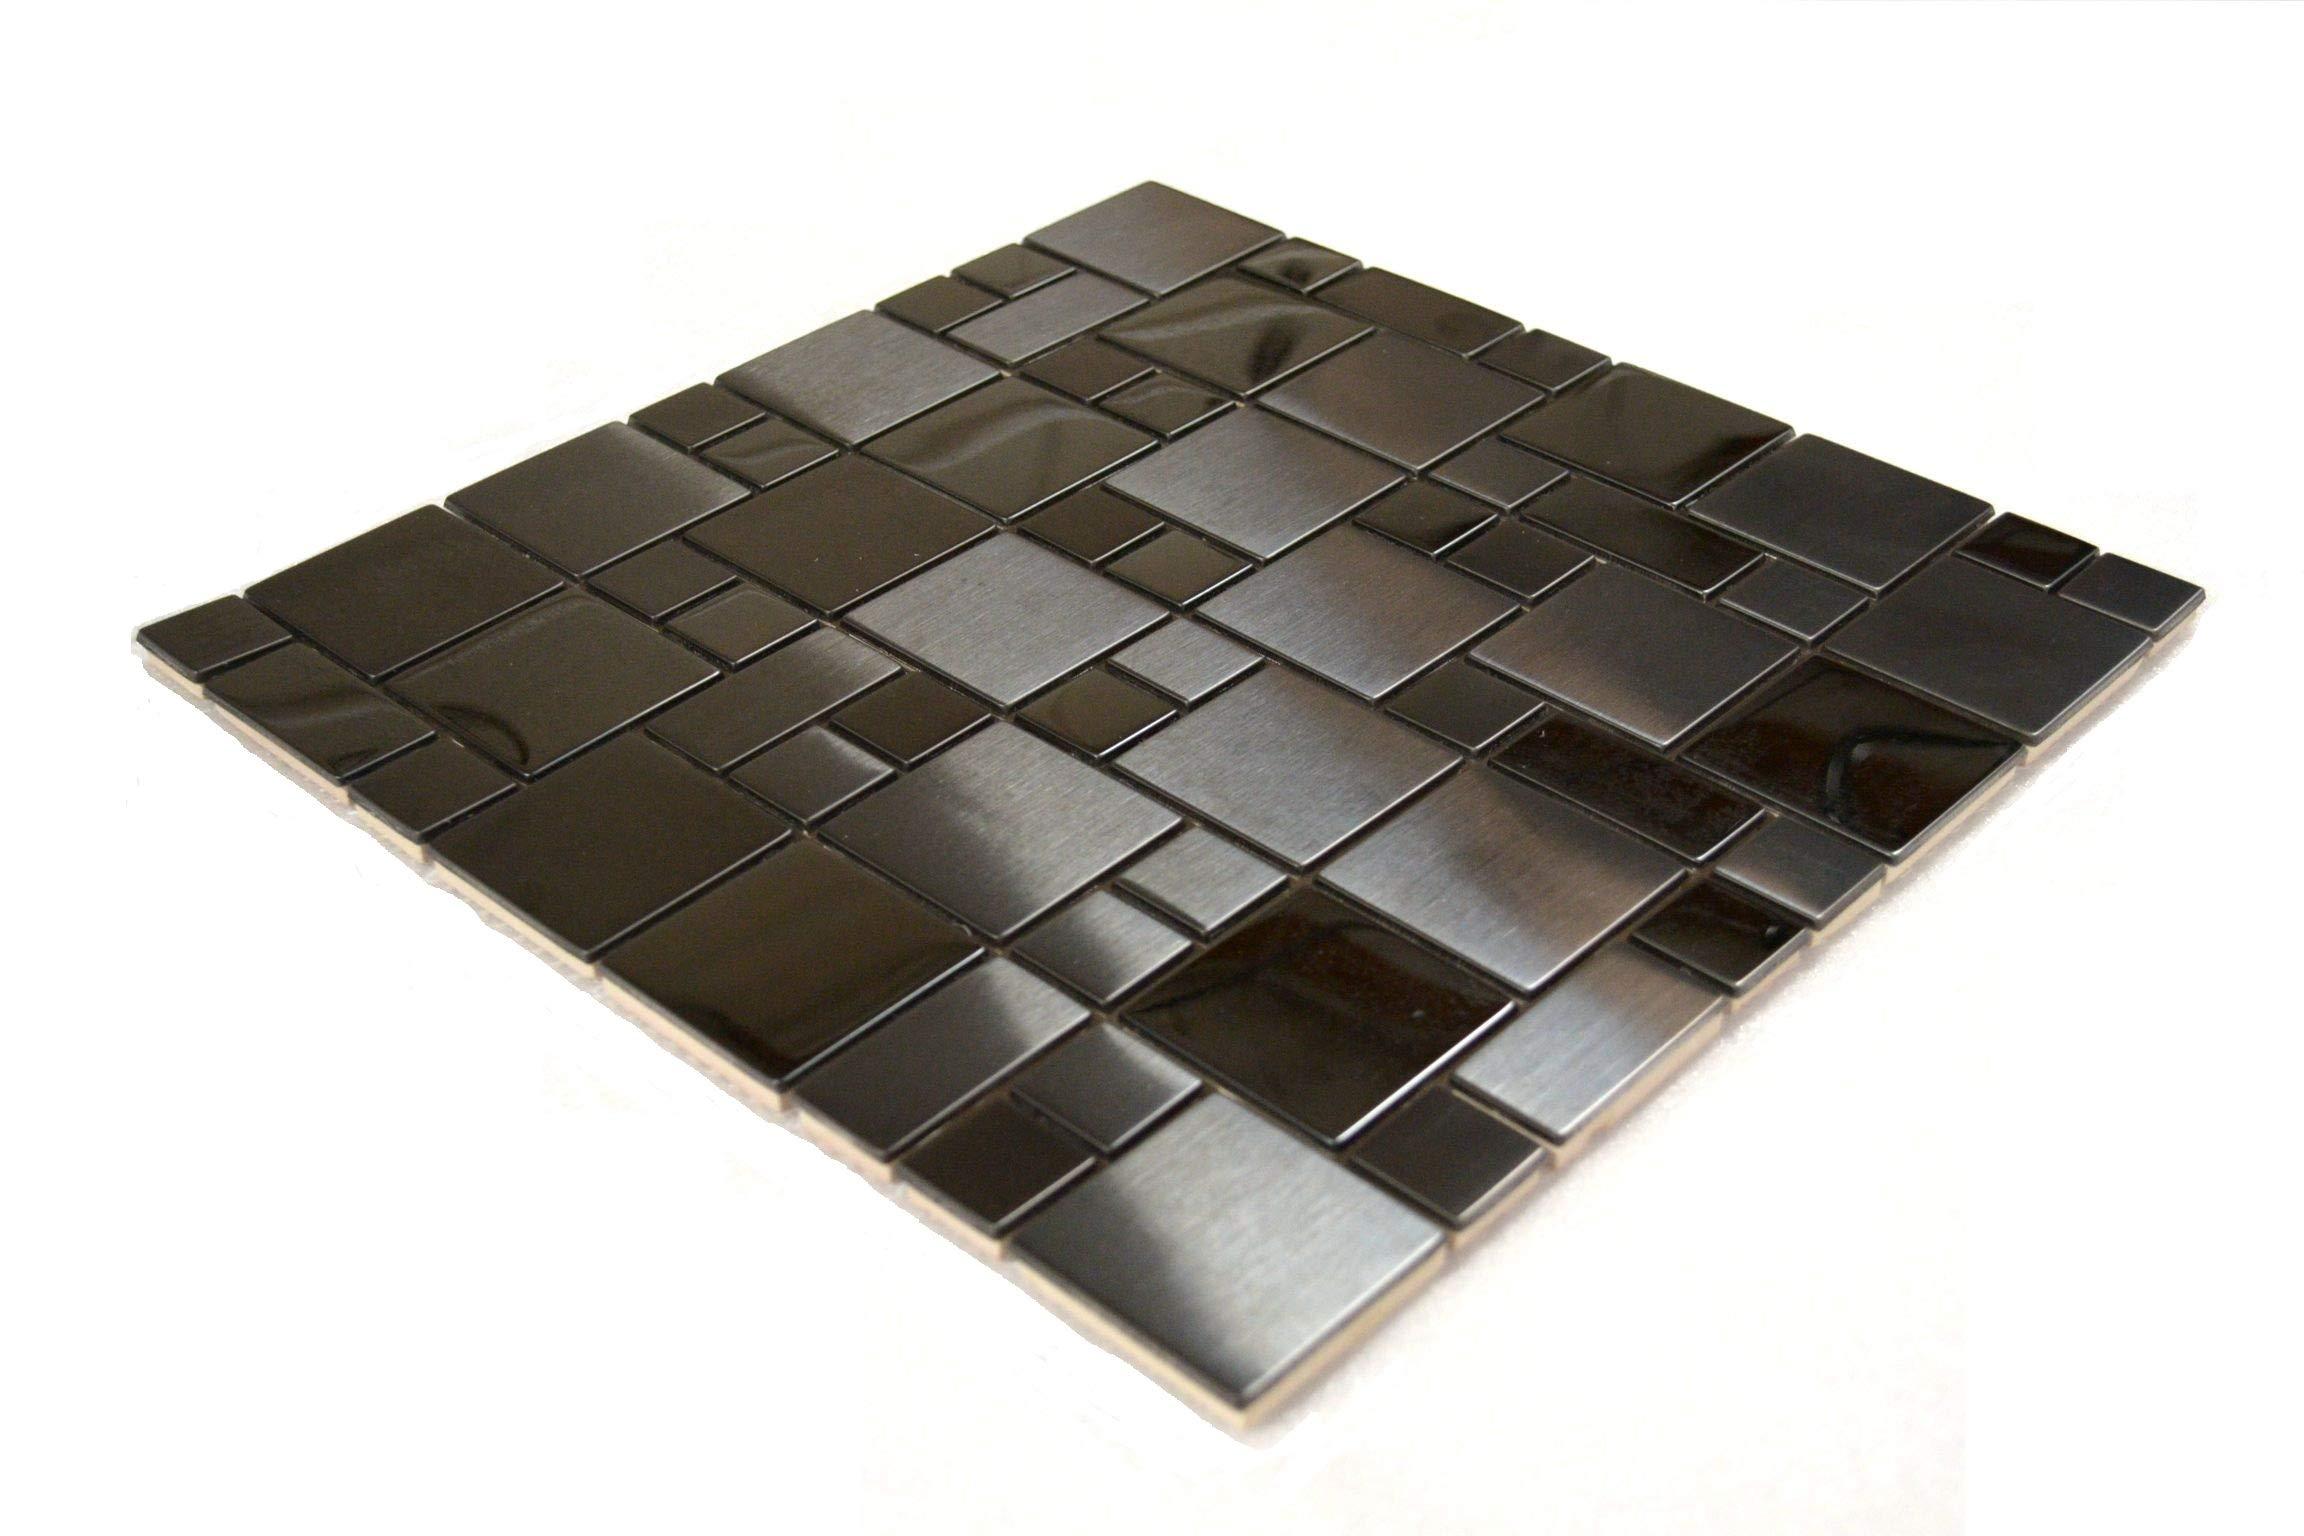 Black Stainless Steel Metal French Pattern Mosaic Tile for Kitchen Backsplash (1 Sheet) by Tile Depot